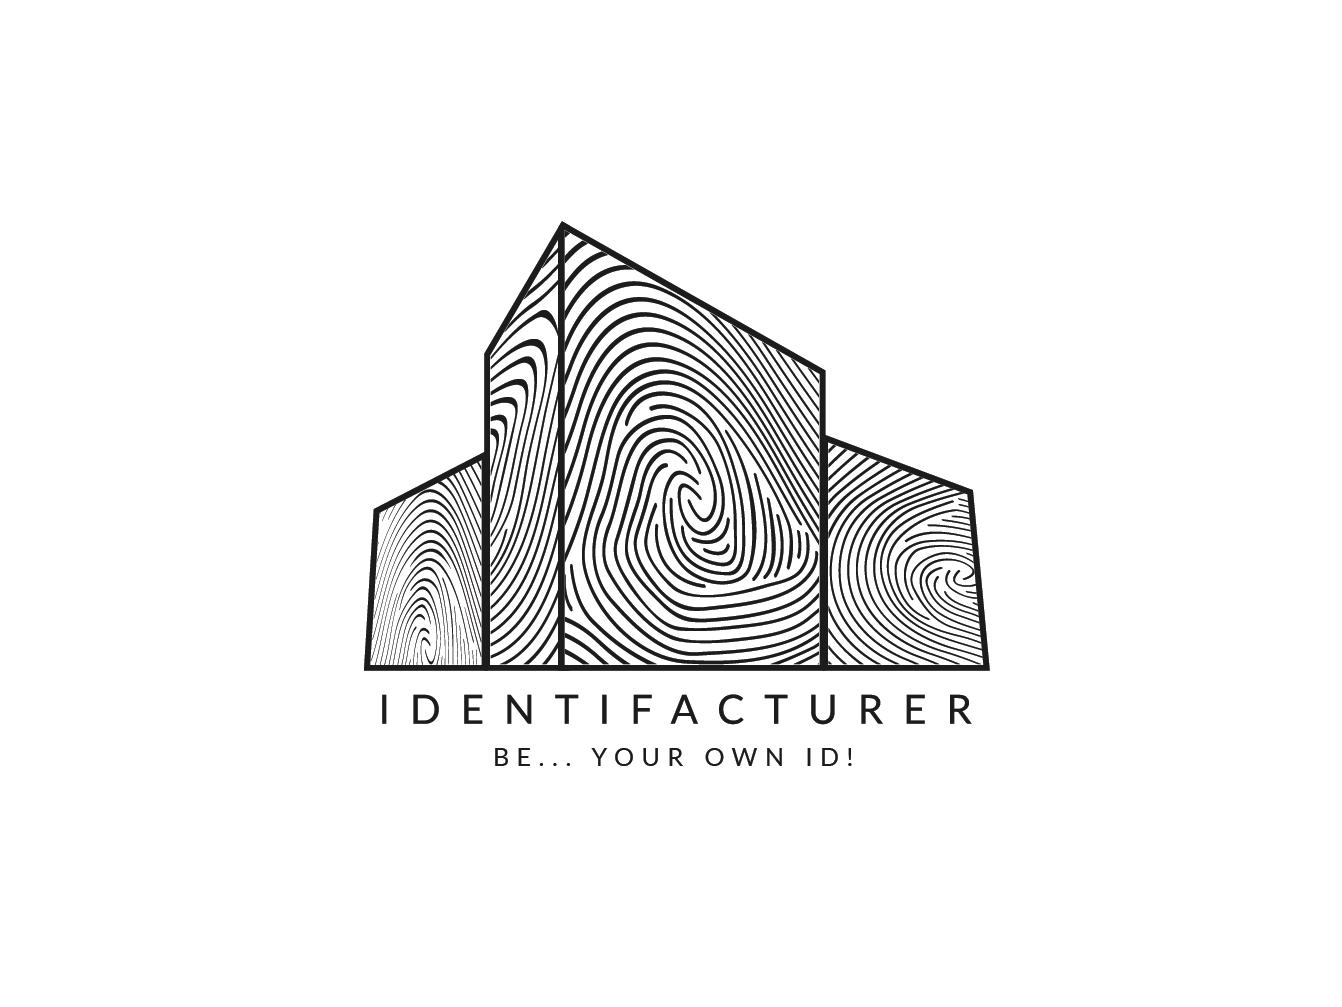 Logo concept for IDENTIFACTURER by Muhammad Armash Khalid on.